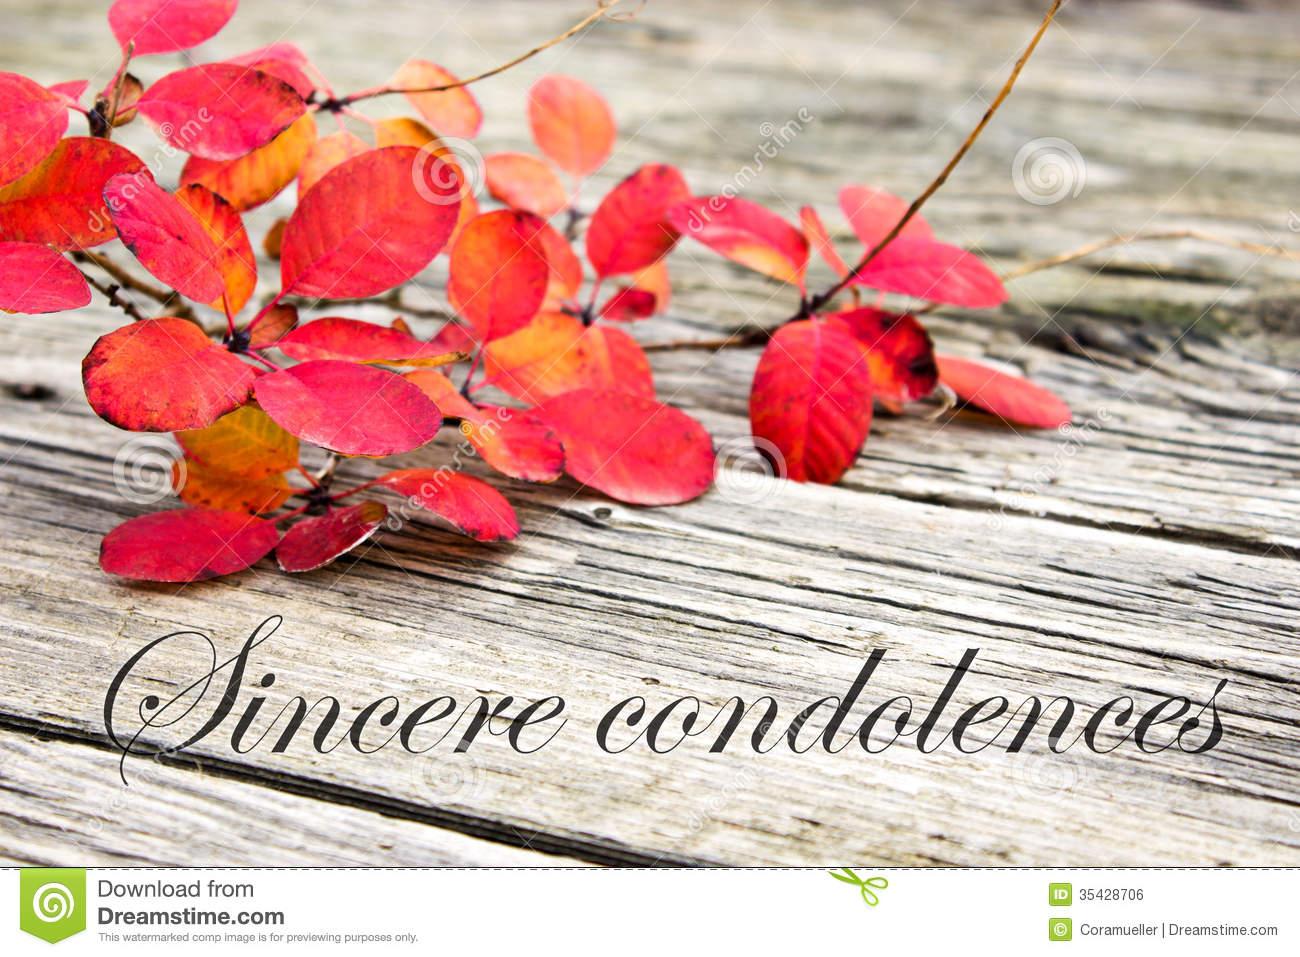 Condolence graphics clip art royalty free download Condolence images free - ClipartFest clip art royalty free download